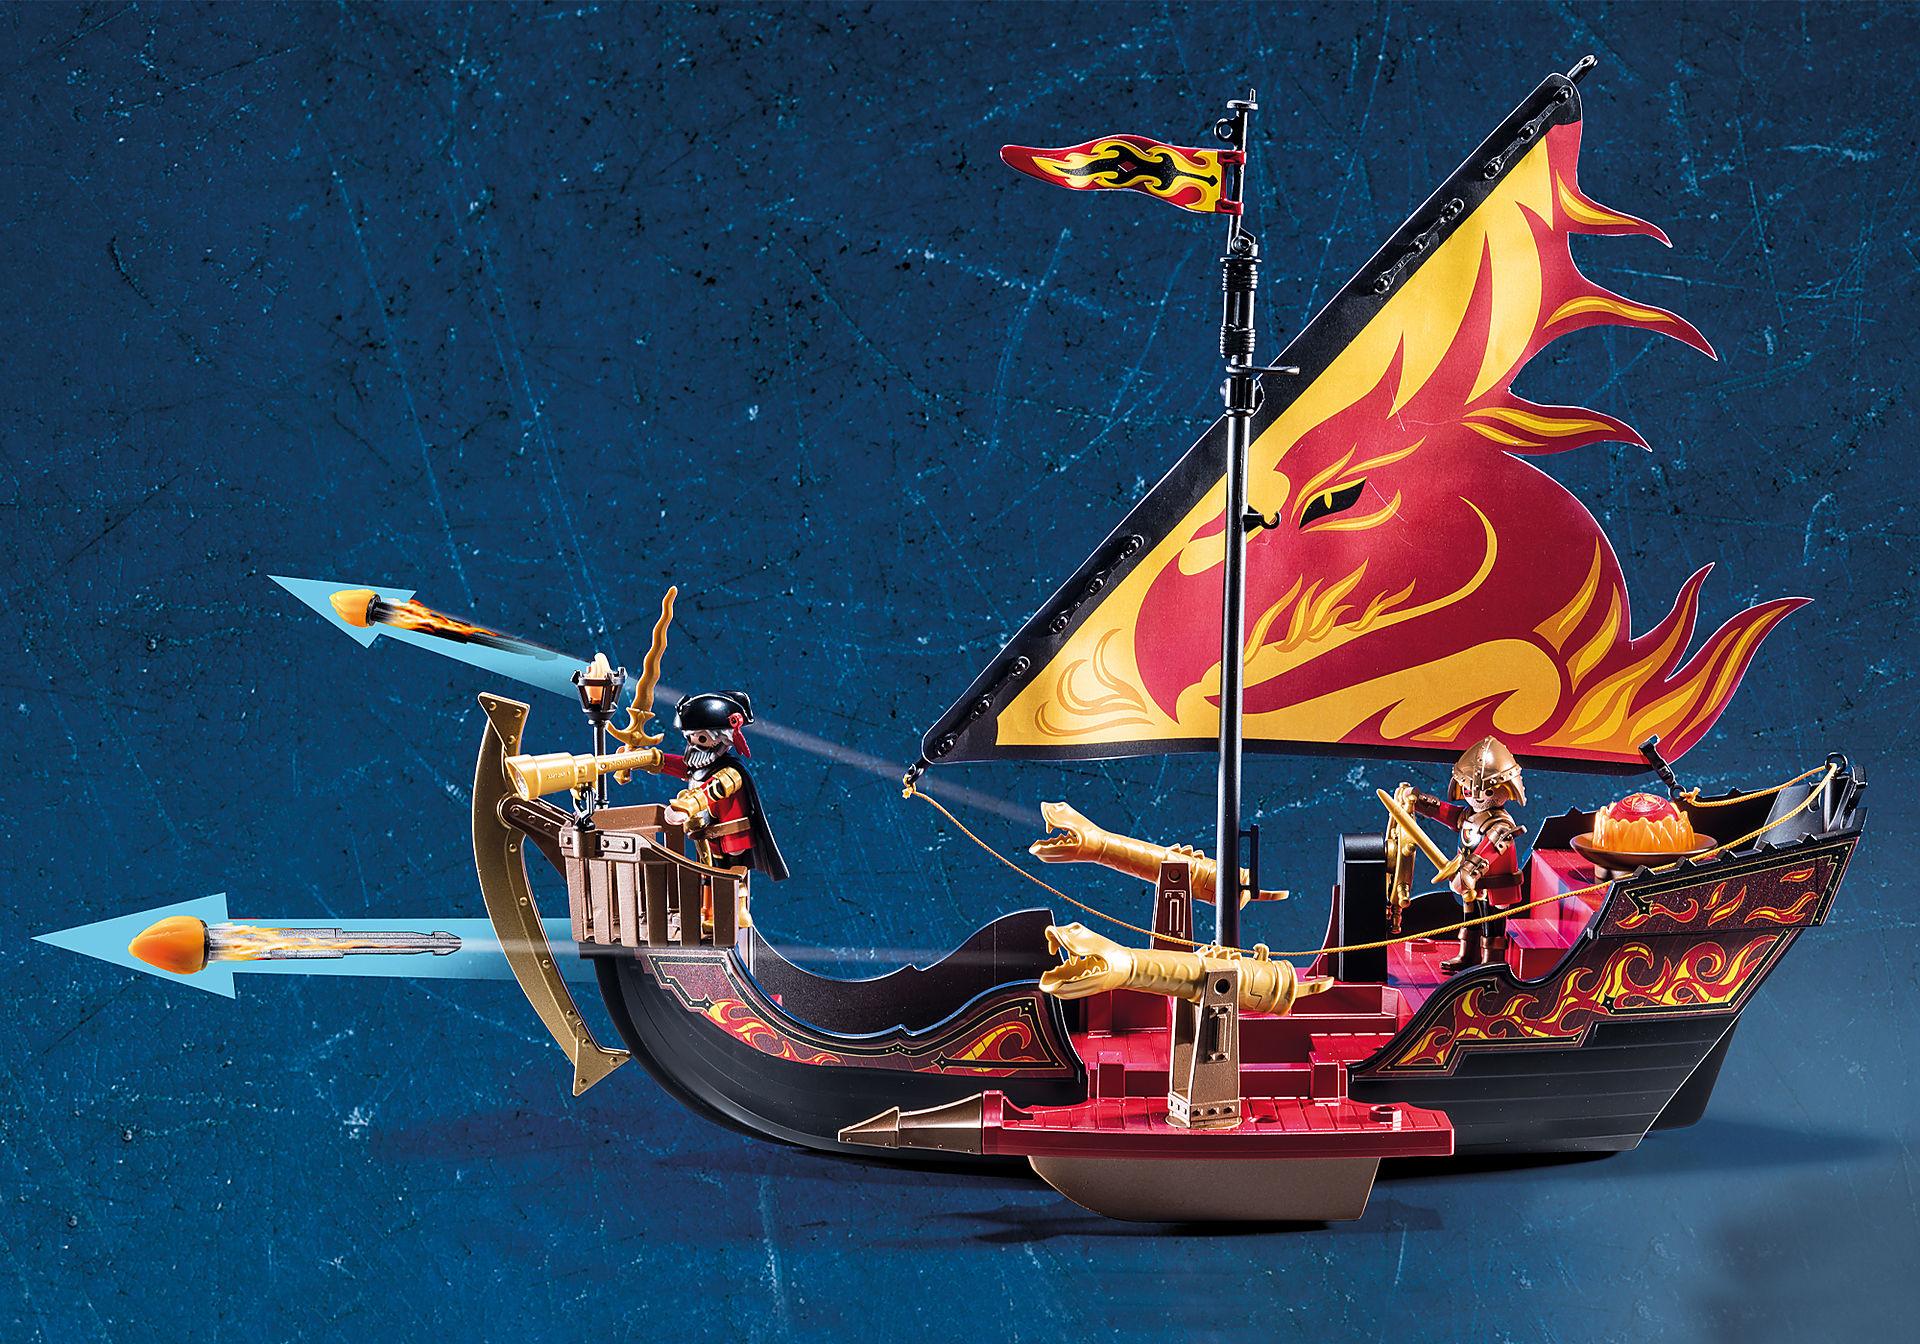 70641 Burnham Raiders Fire Ship zoom image9